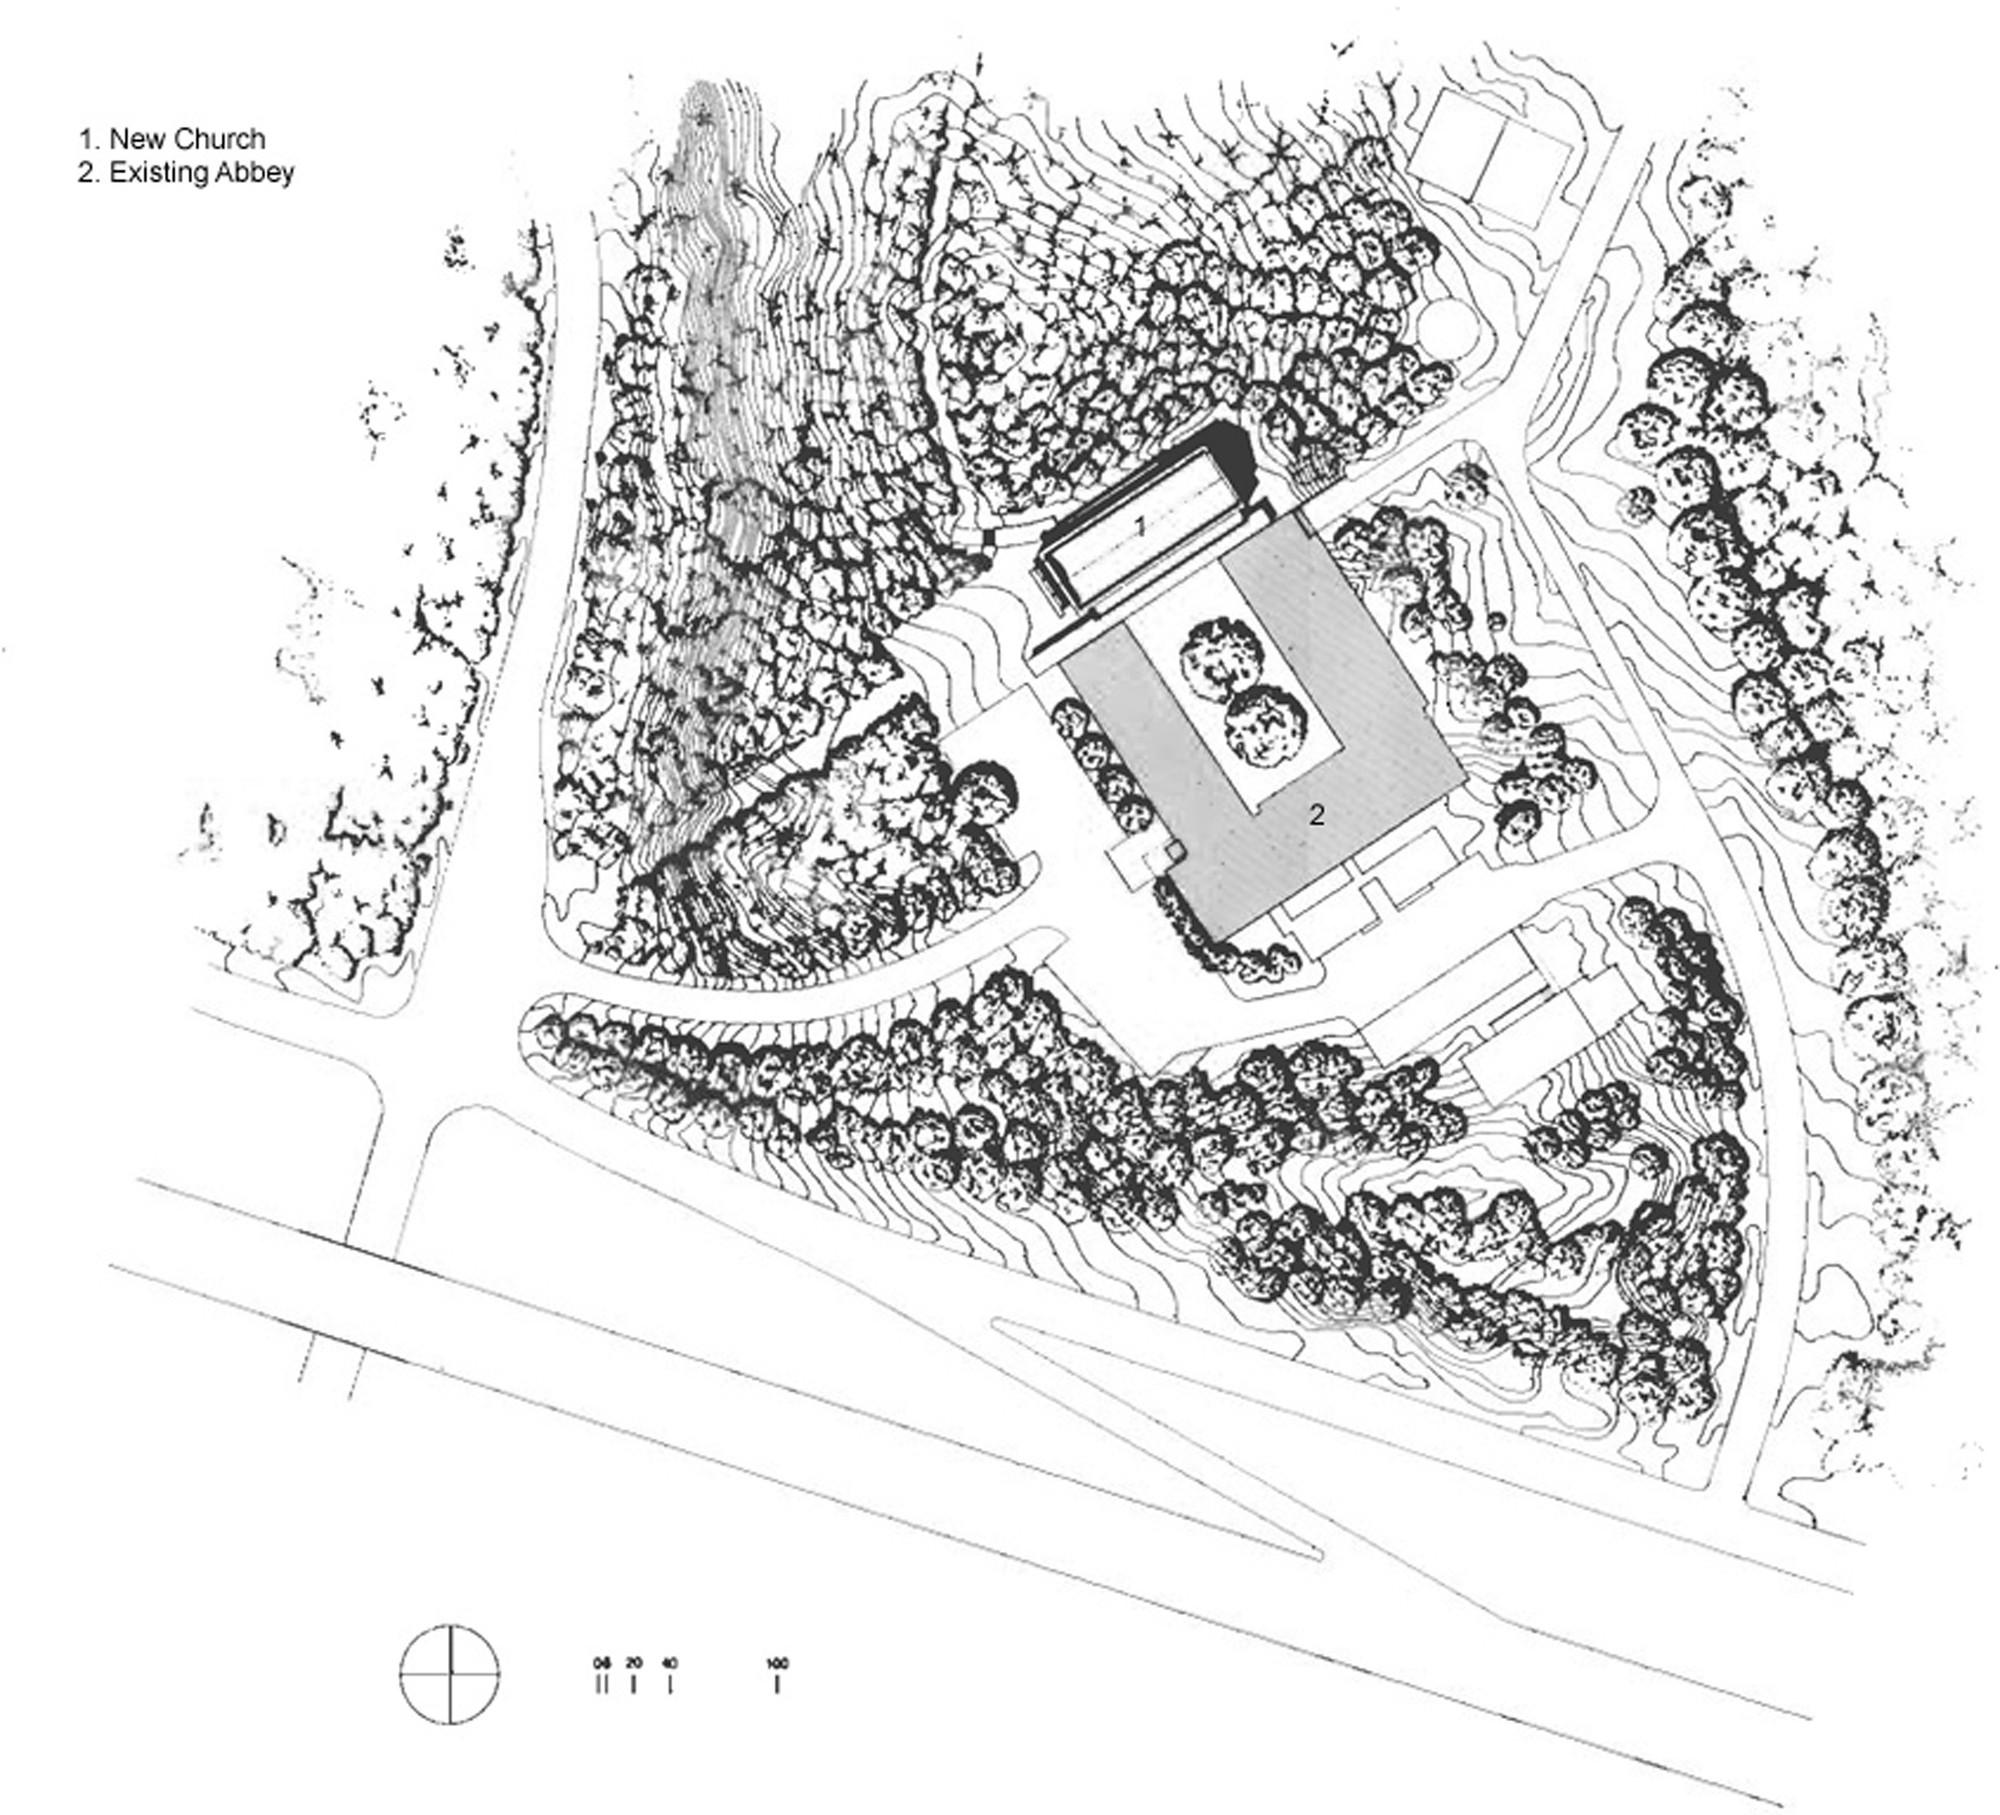 Cistercian Abbey Church / Cunningham Architects